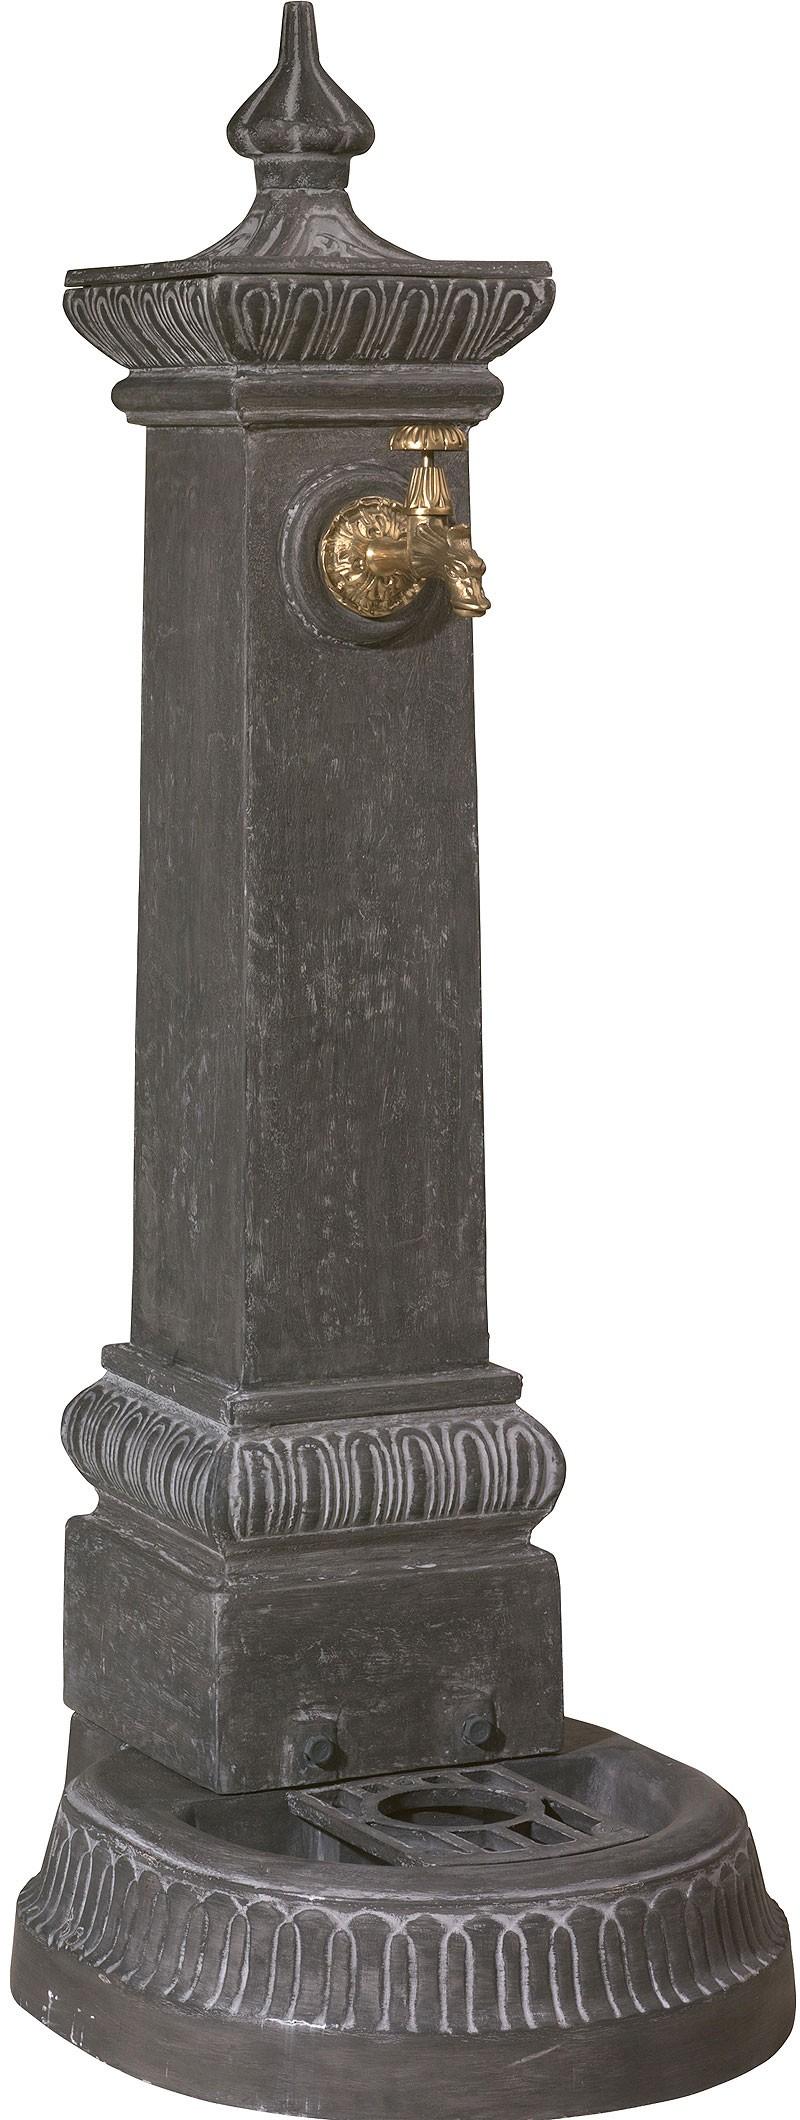 Fontaine fonte st roch grise - Fontaine exterieure fonte ...